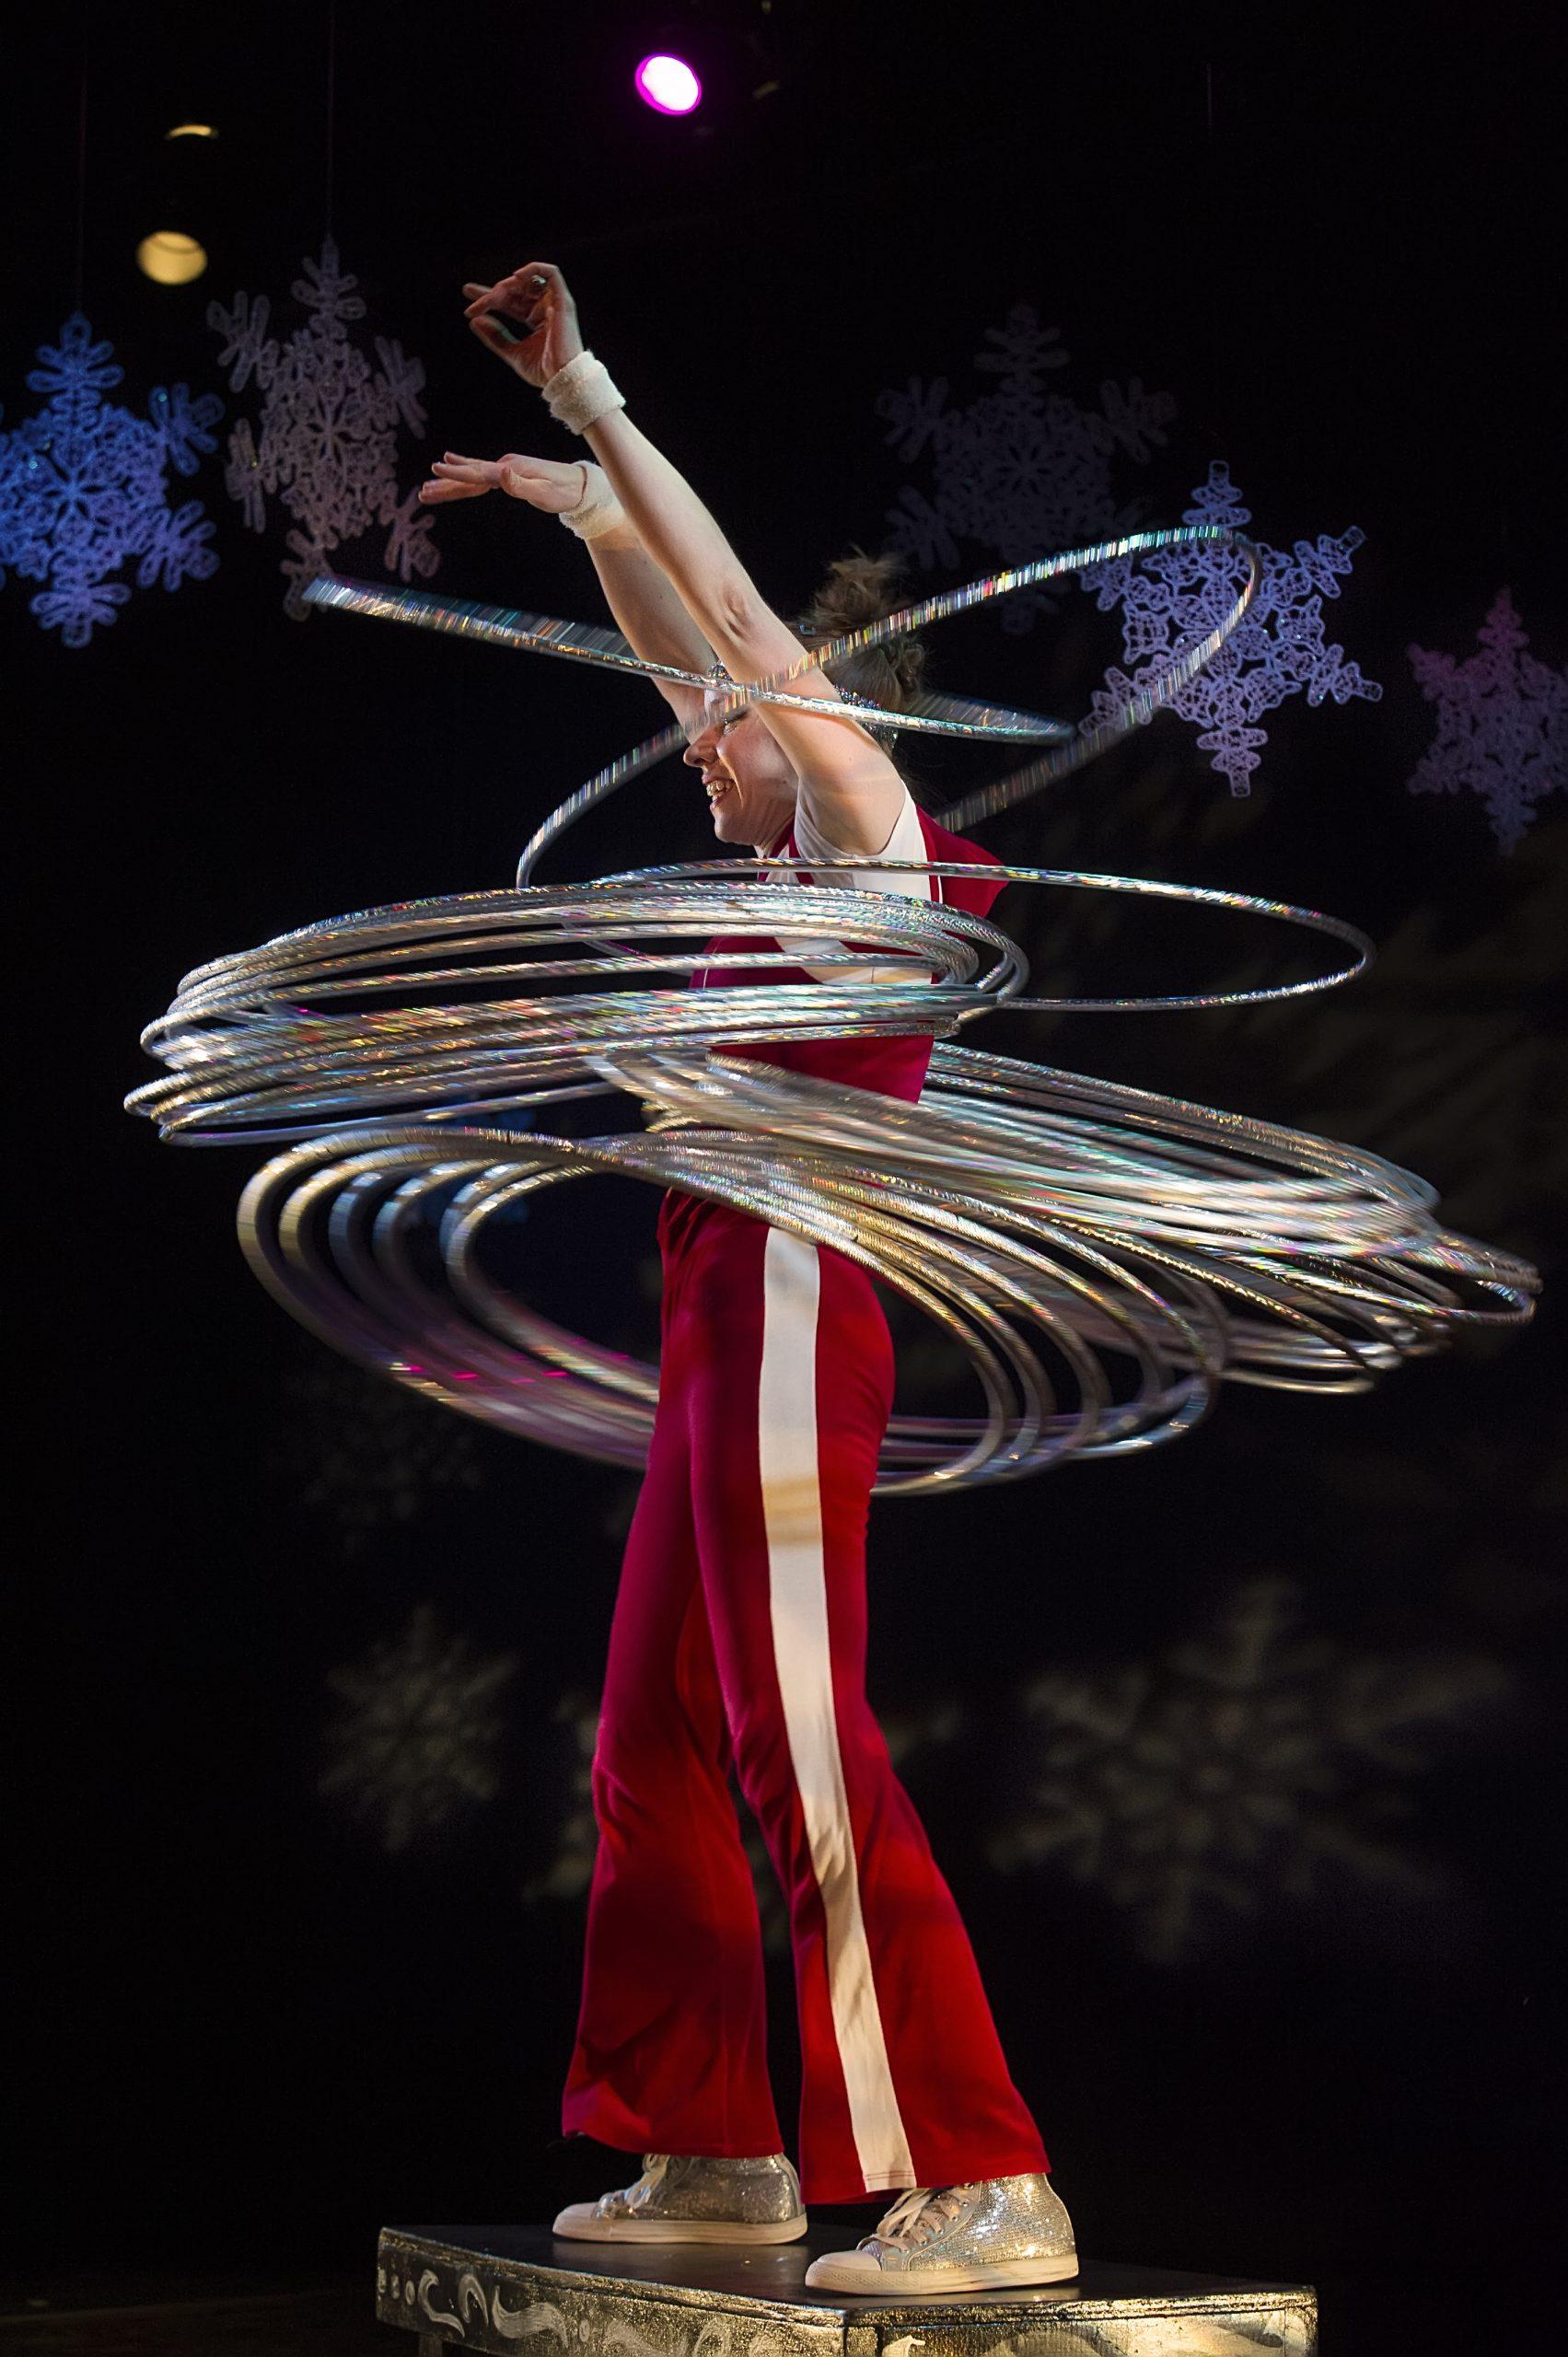 Dec 26-29: Mittens and Mistletoe